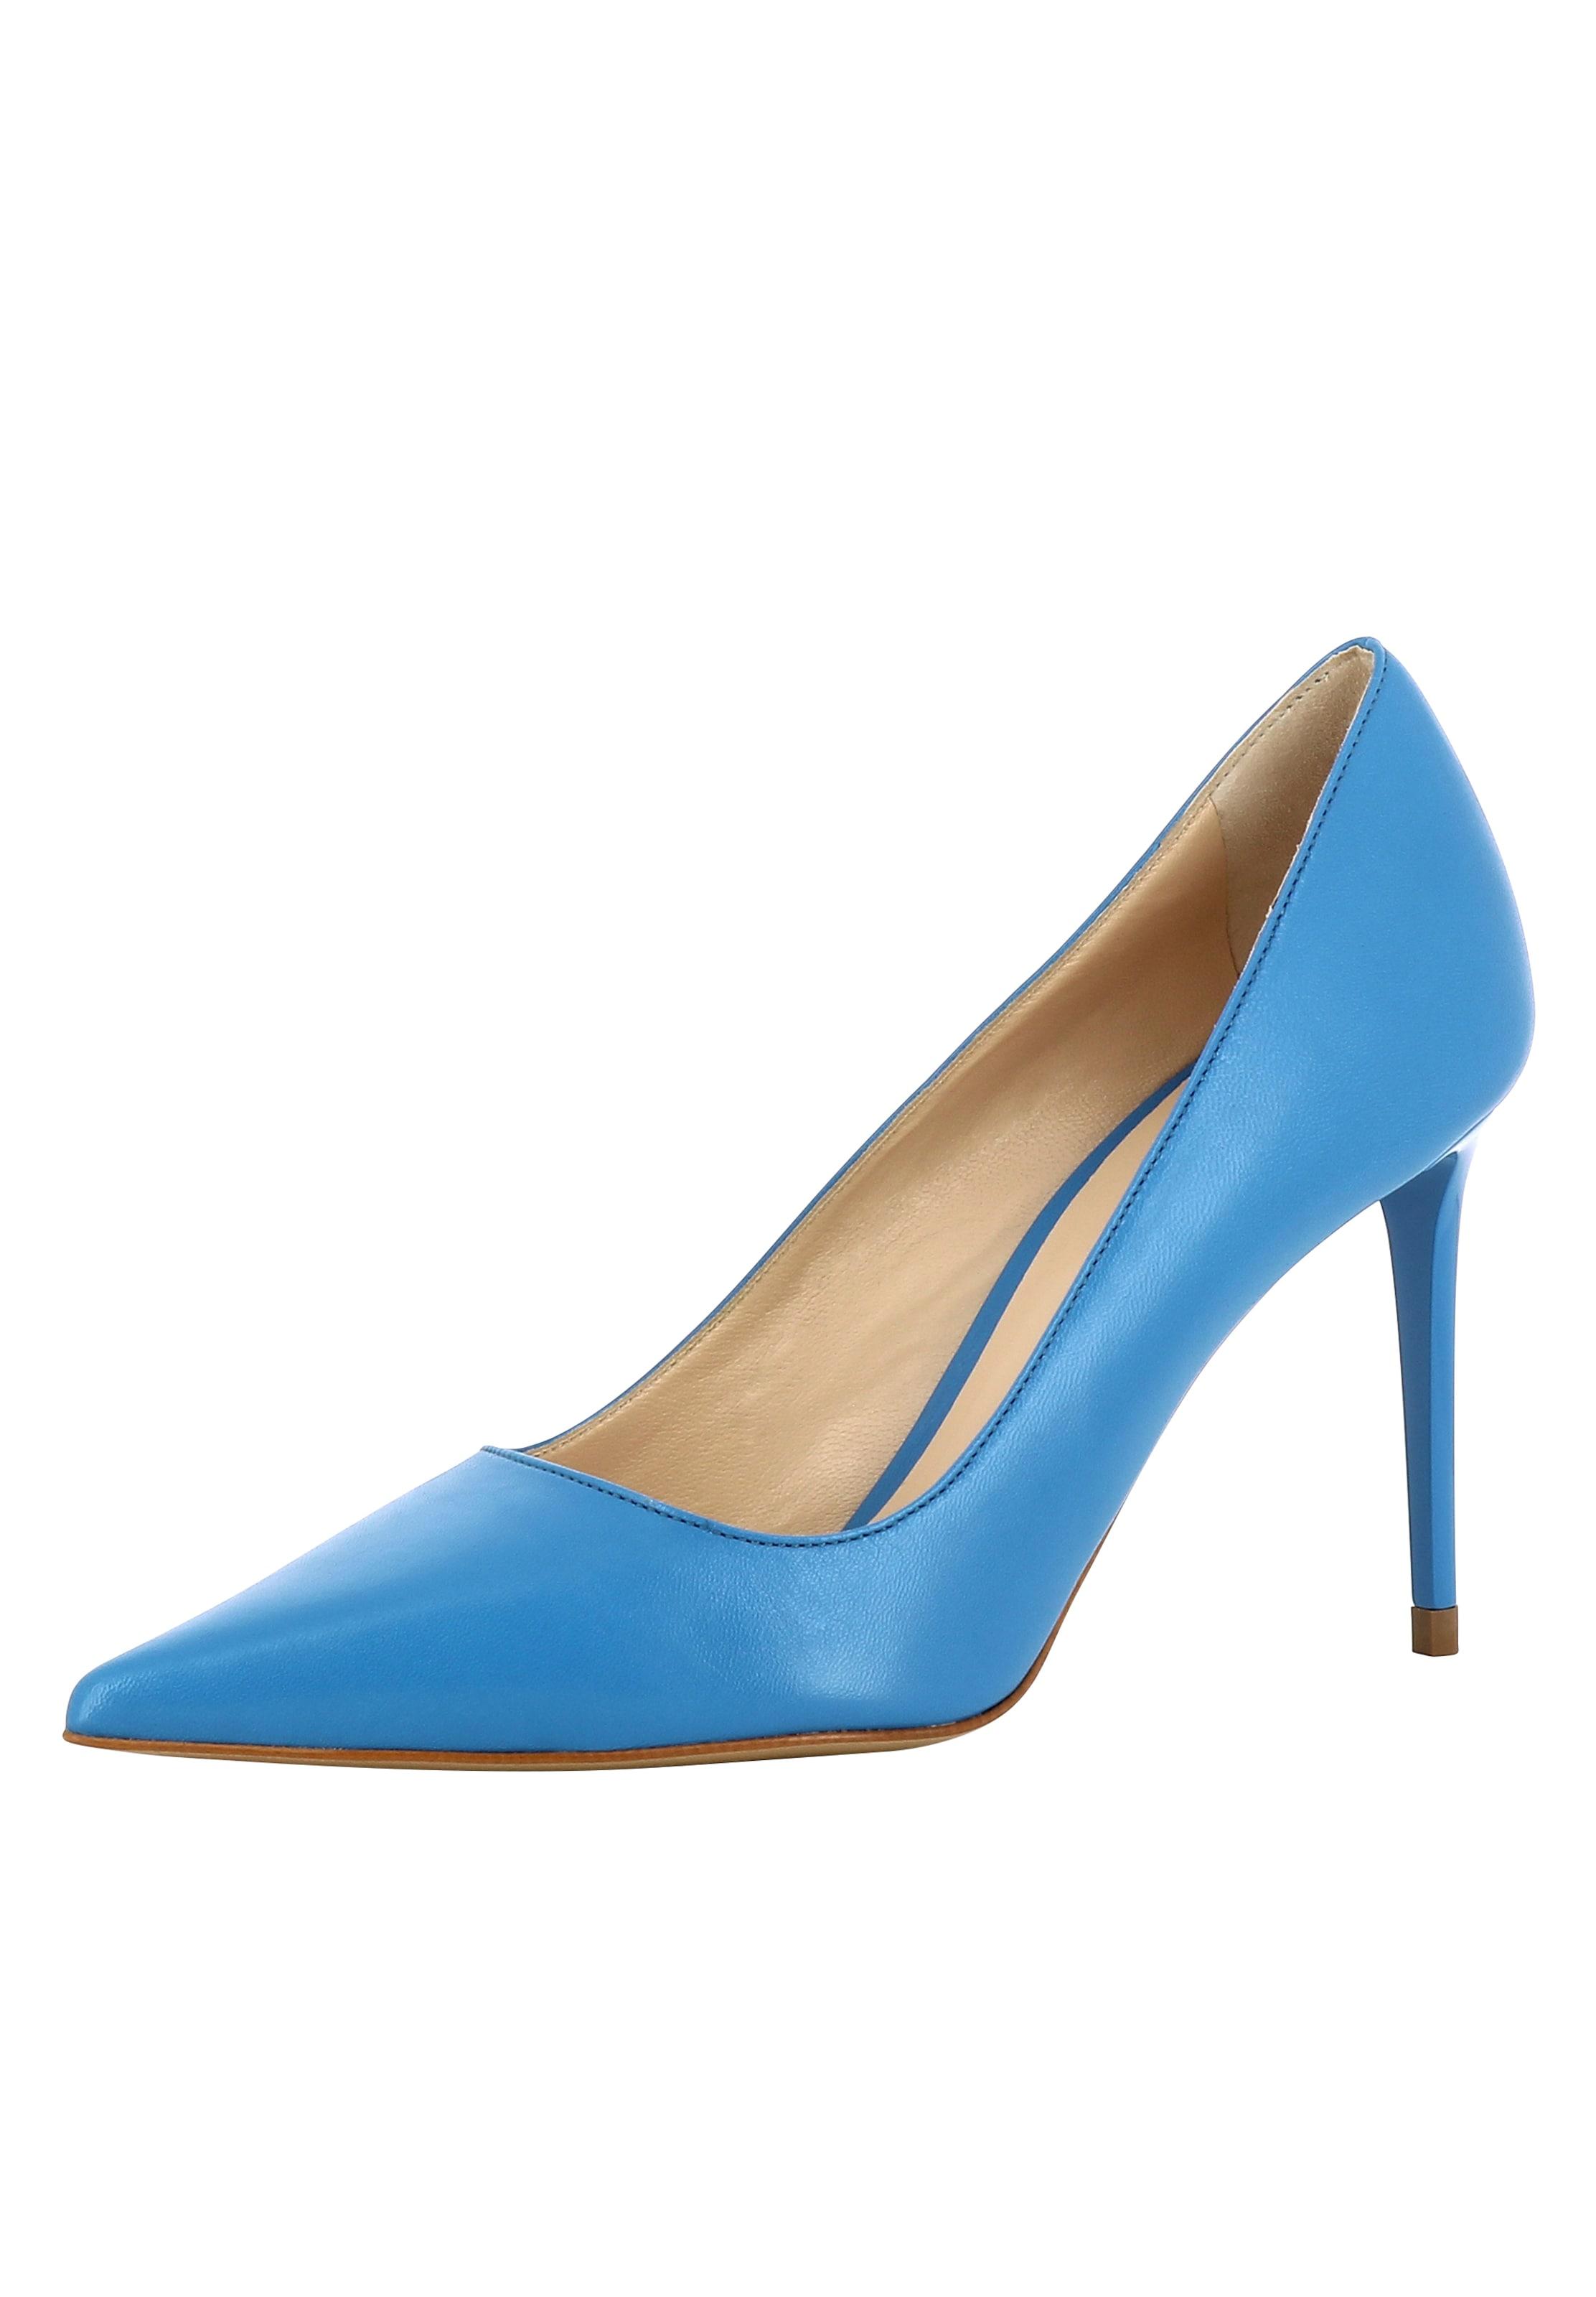 Haltbare Mode billige Schuhe EVITA | Pumps 'NATALIA' Schuhe Gut getragene Schuhe